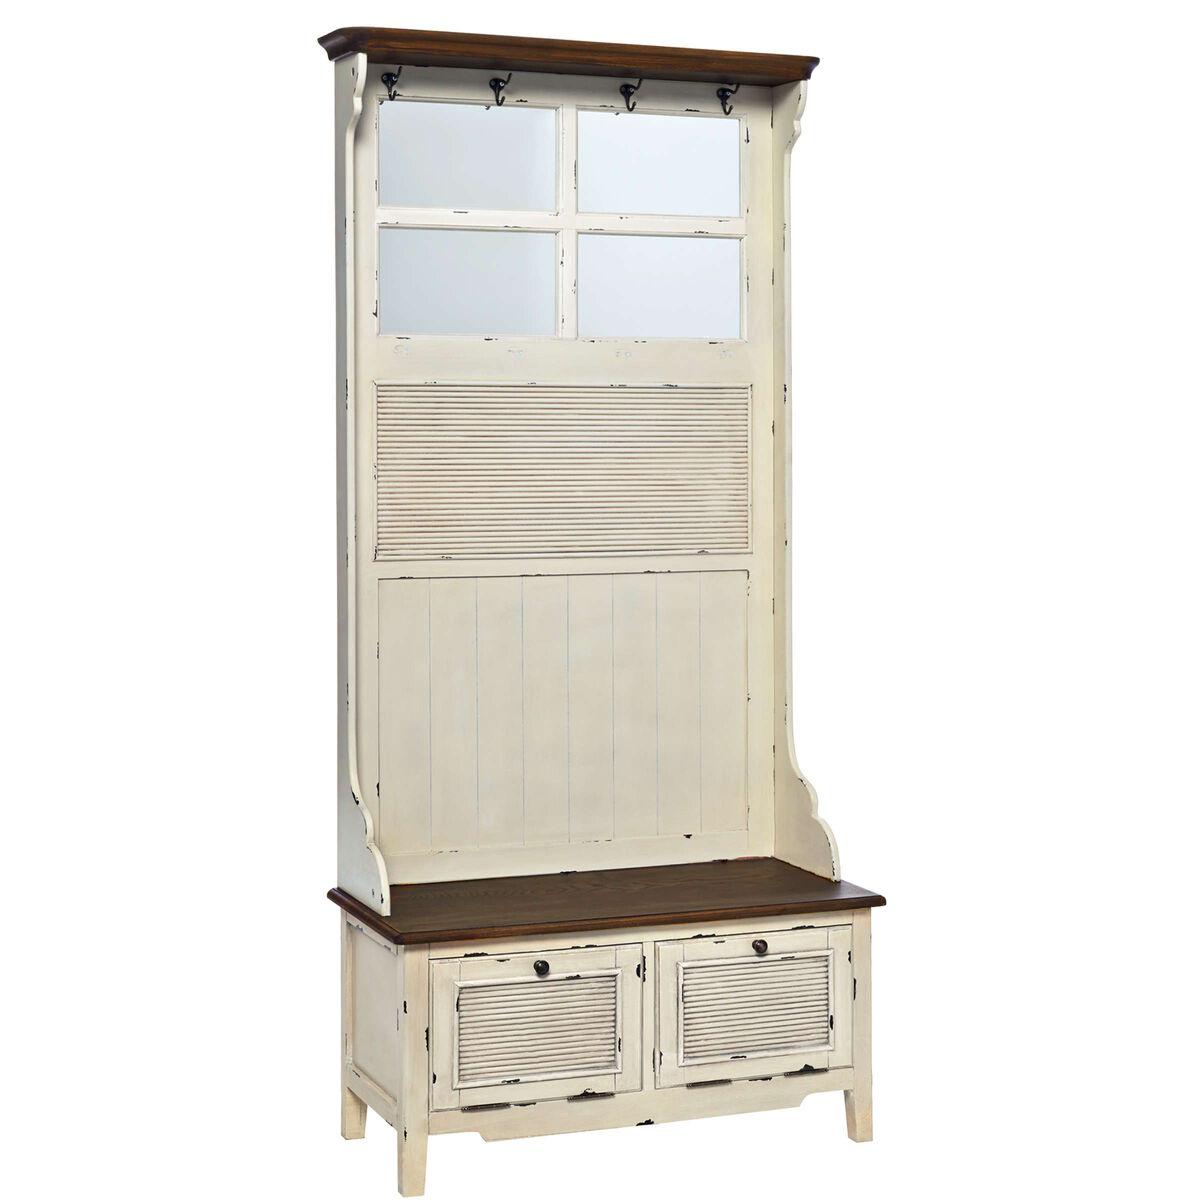 cabott cove garderobe mit spiegel butlers. Black Bedroom Furniture Sets. Home Design Ideas